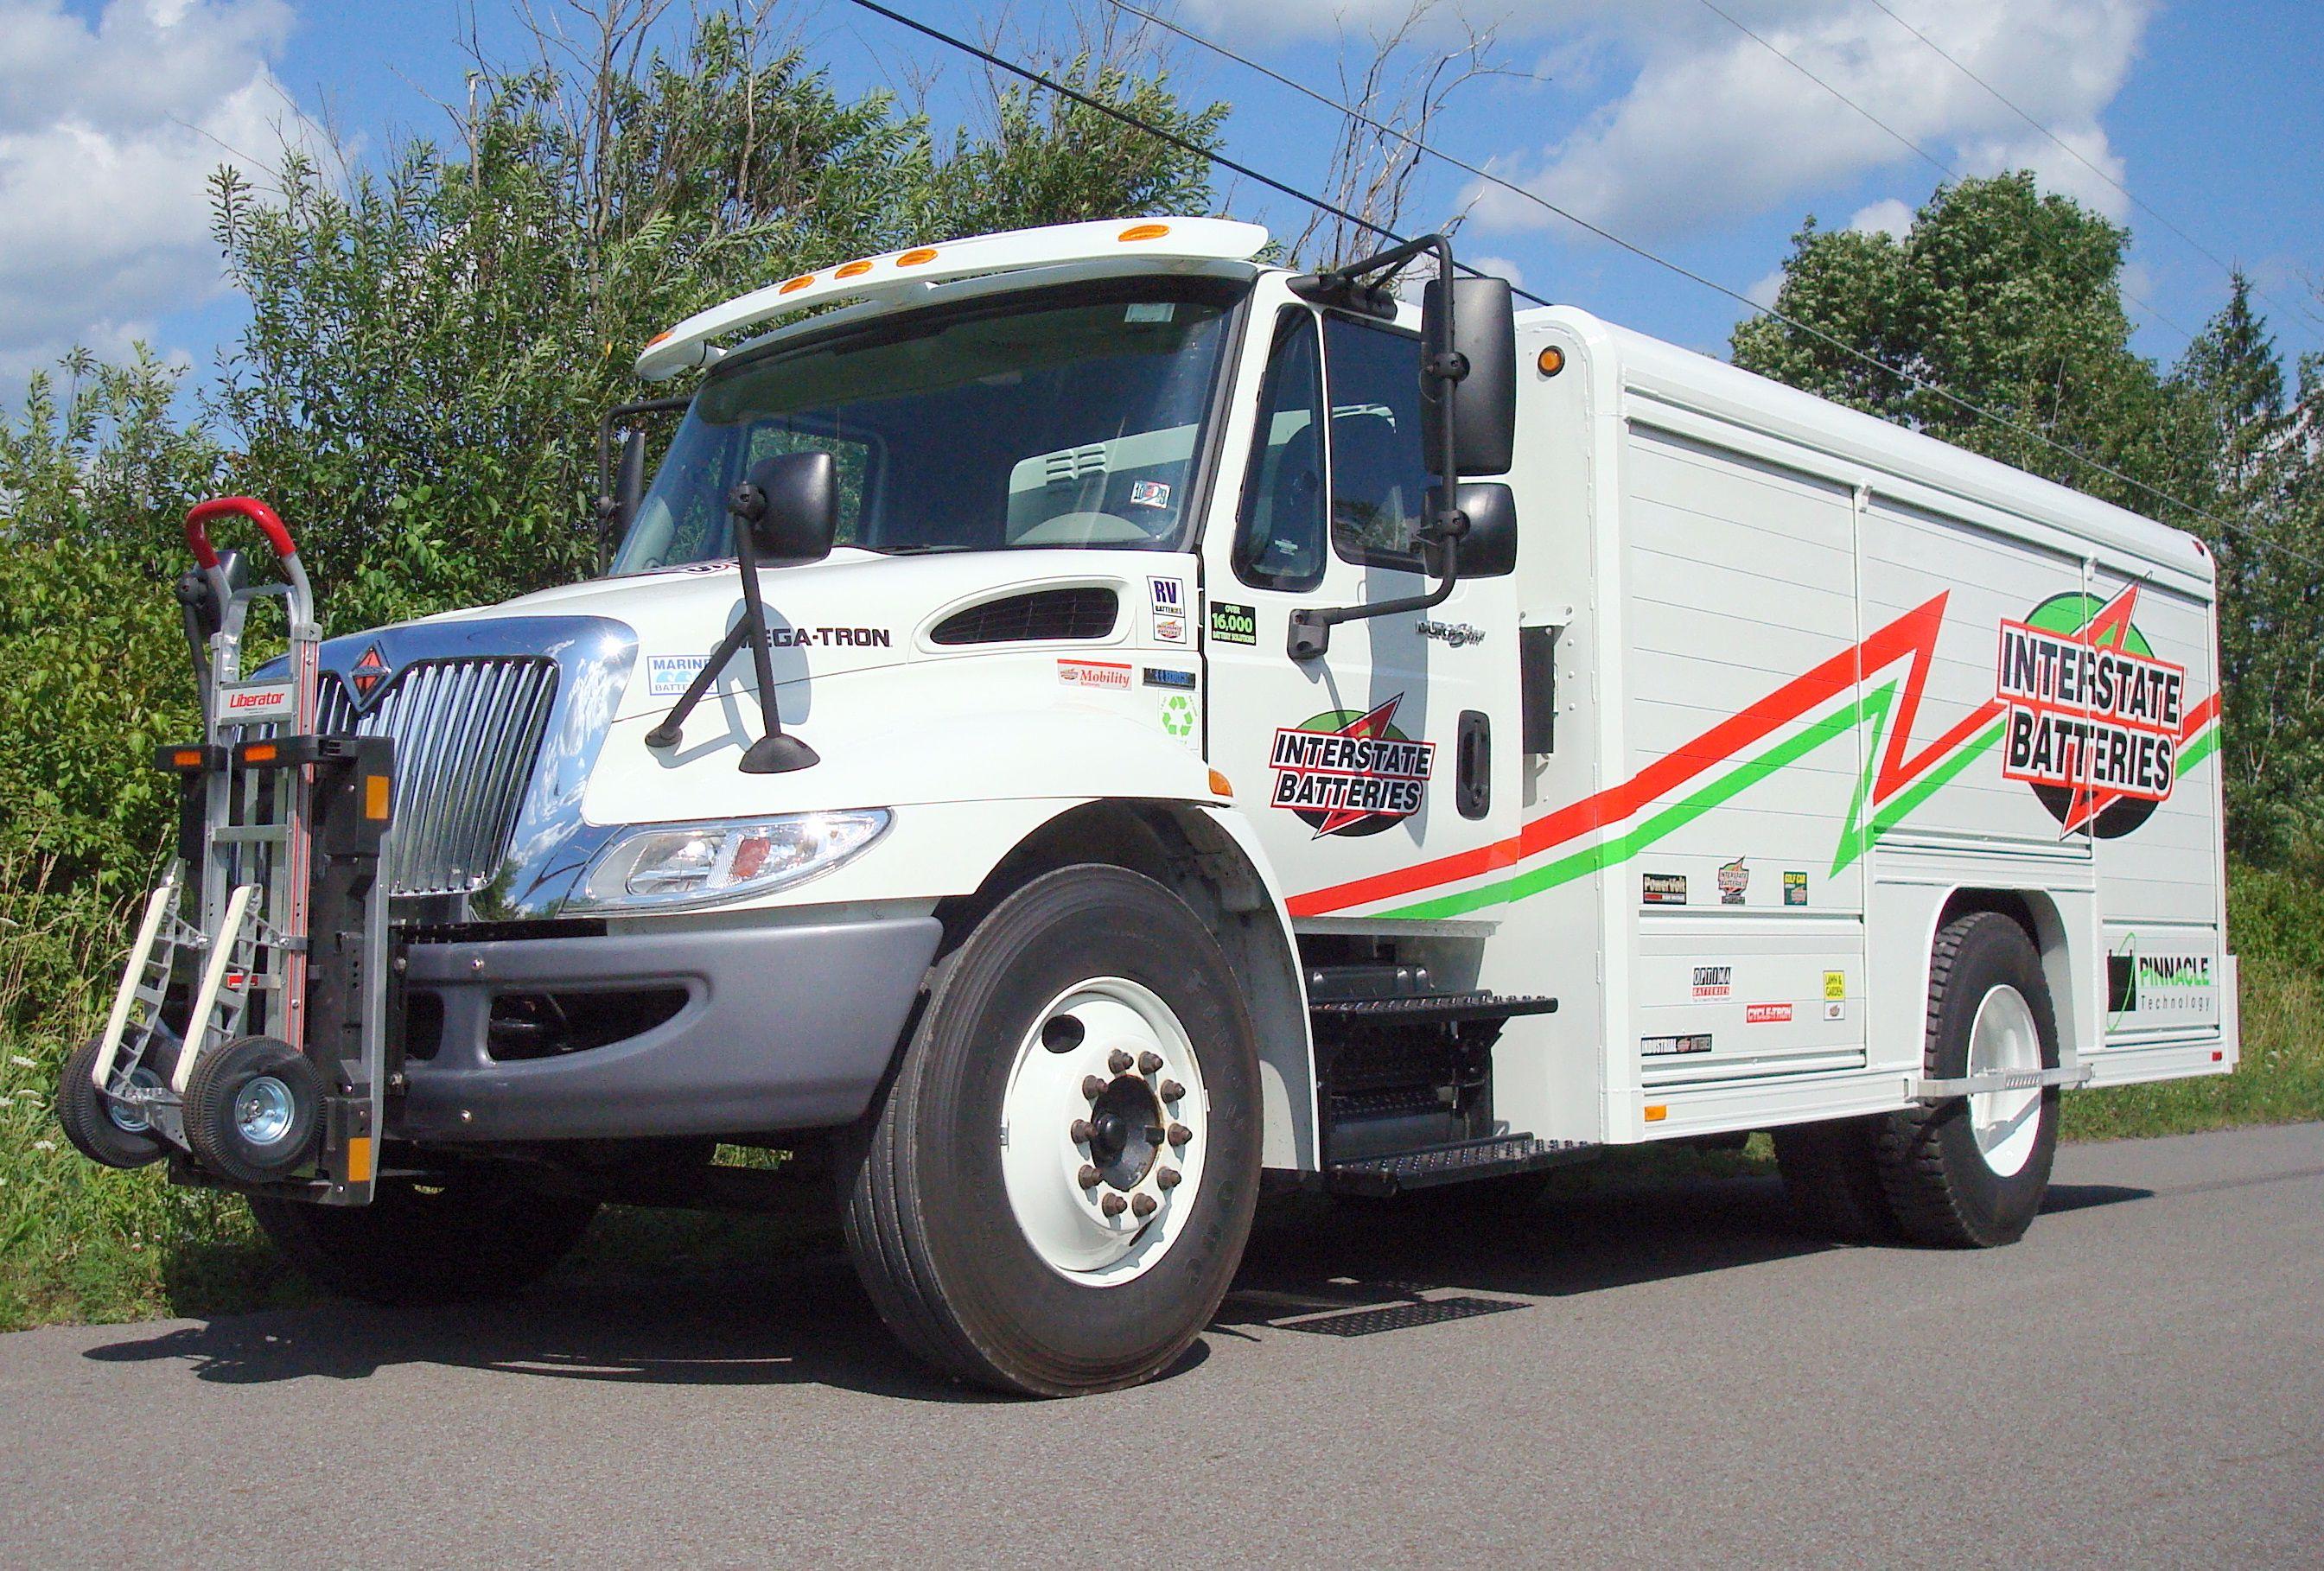 Interstate Batteries Navistar 4200 Durastar Series Route Delivery Truck With Mickey Truck Body And Hts 10t Tilt Mount Hand T Trucks Hand Trucks Truck Transport